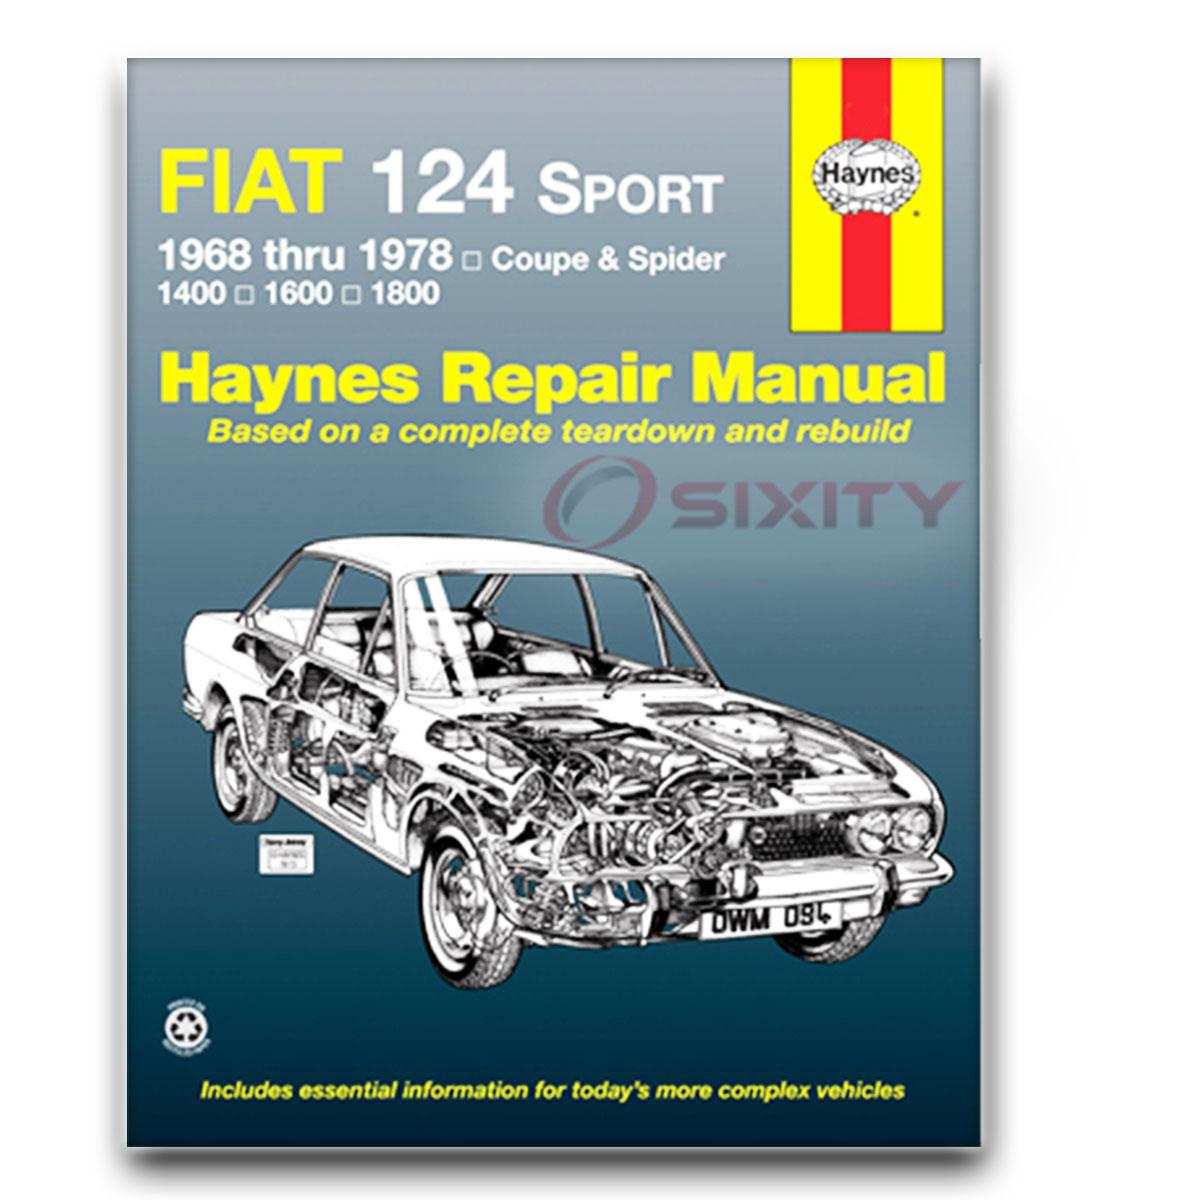 Haynes Repair Manual for Fiat 124 Base Spider Shop Service Garage Book yi